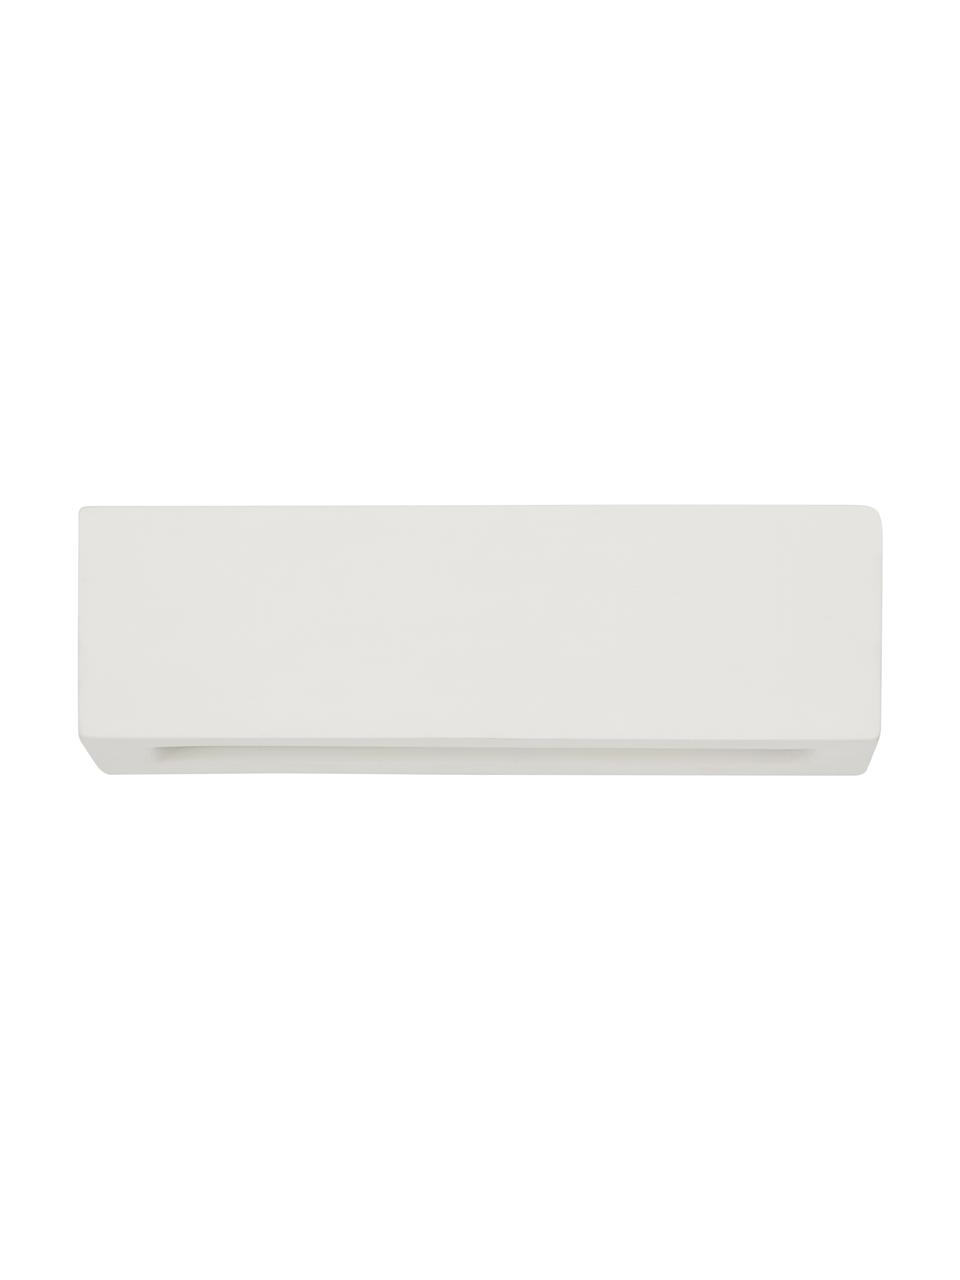 Keramik-Wandleuchte Madrid, Lampenschirm: Keramik, matt, Cremeweiß, 32 x 9 cm